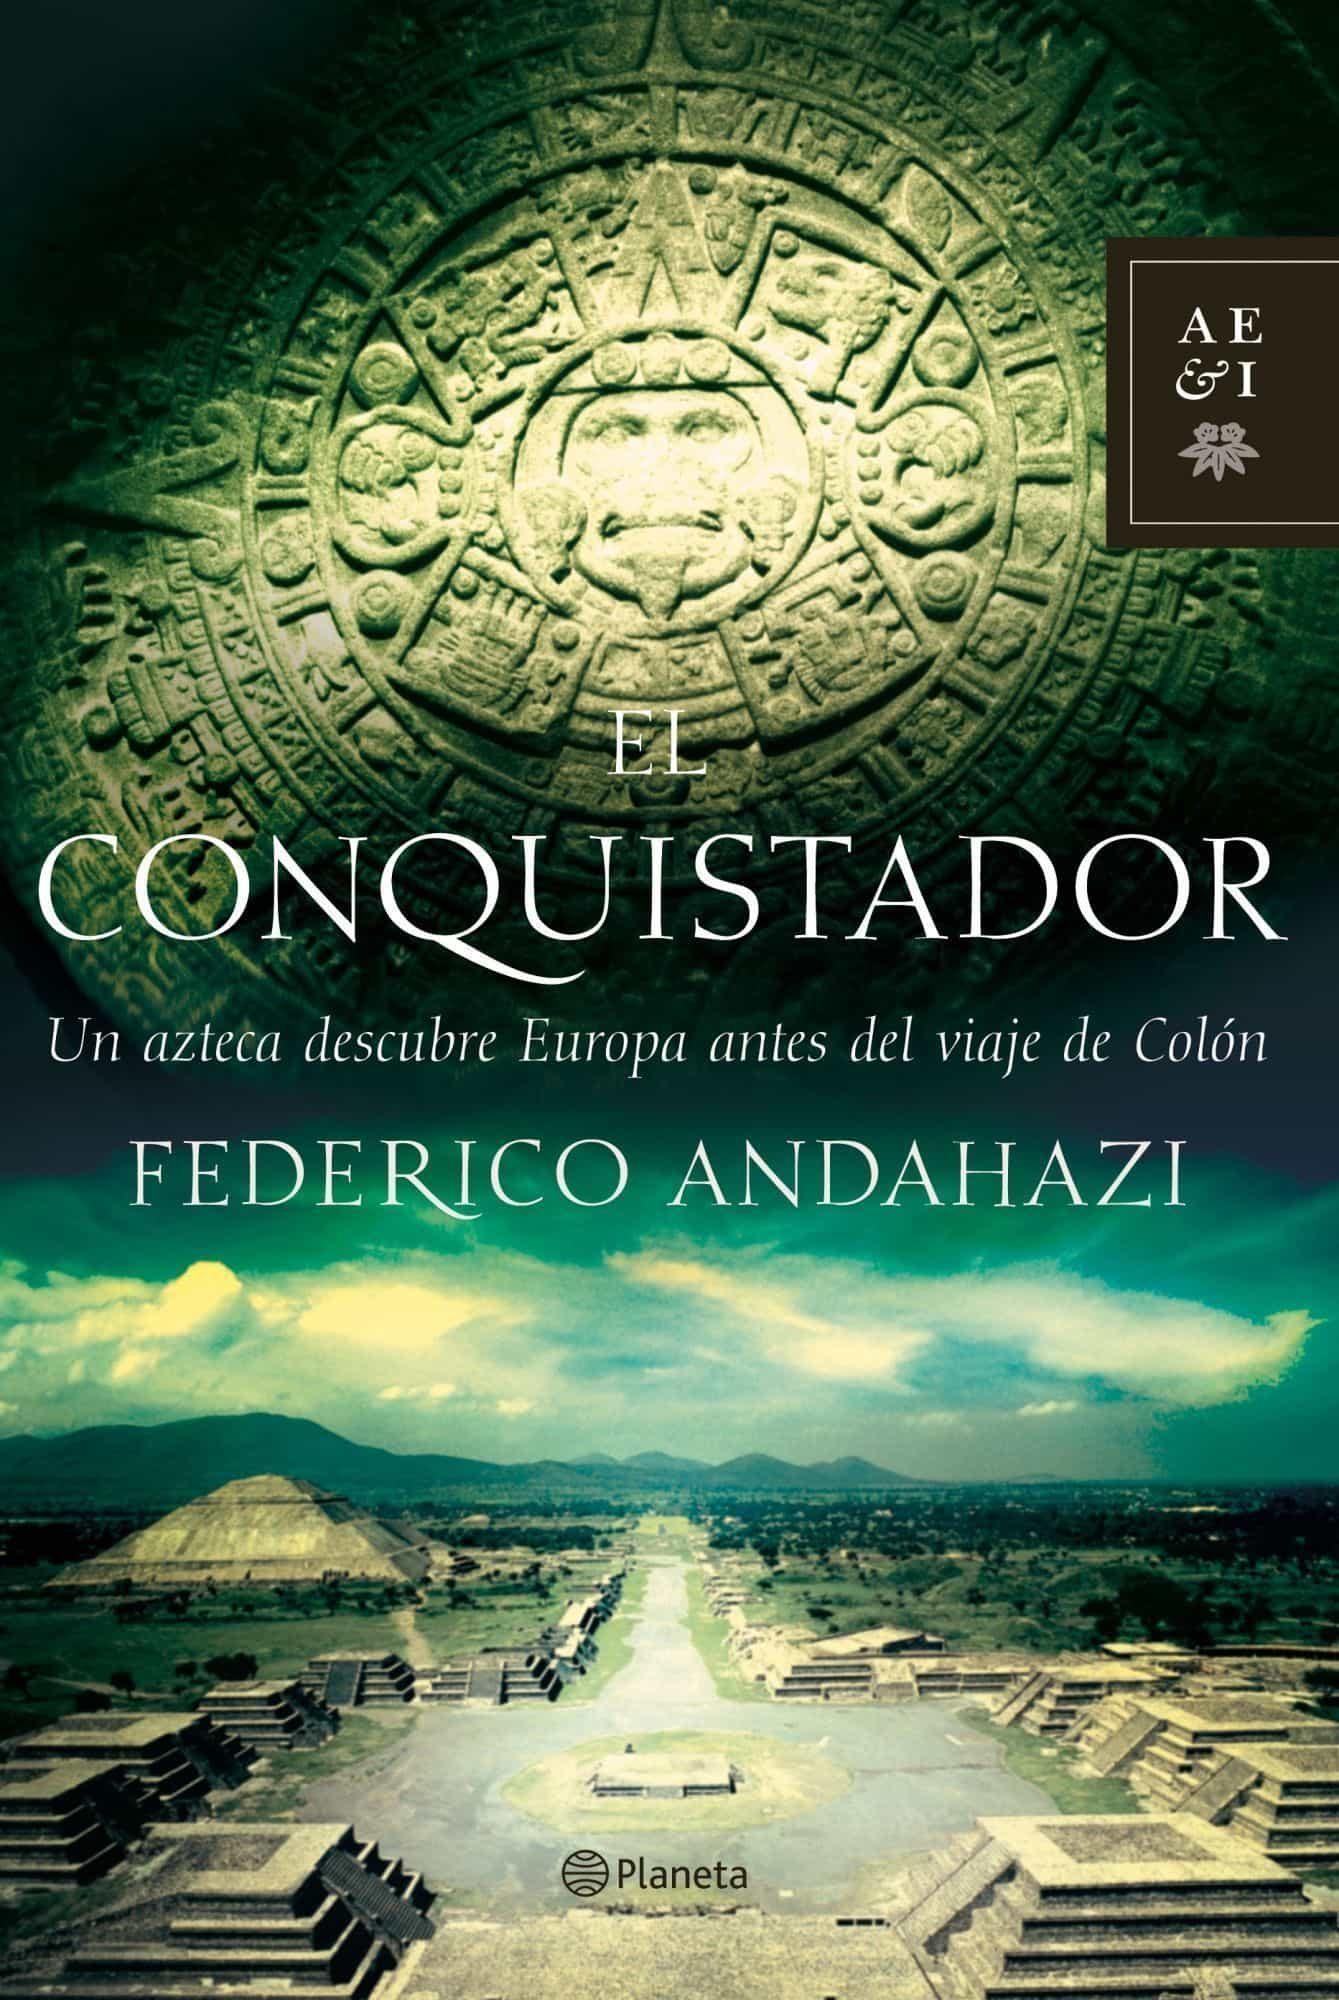 El conquistador federico andahazi 9788408073550